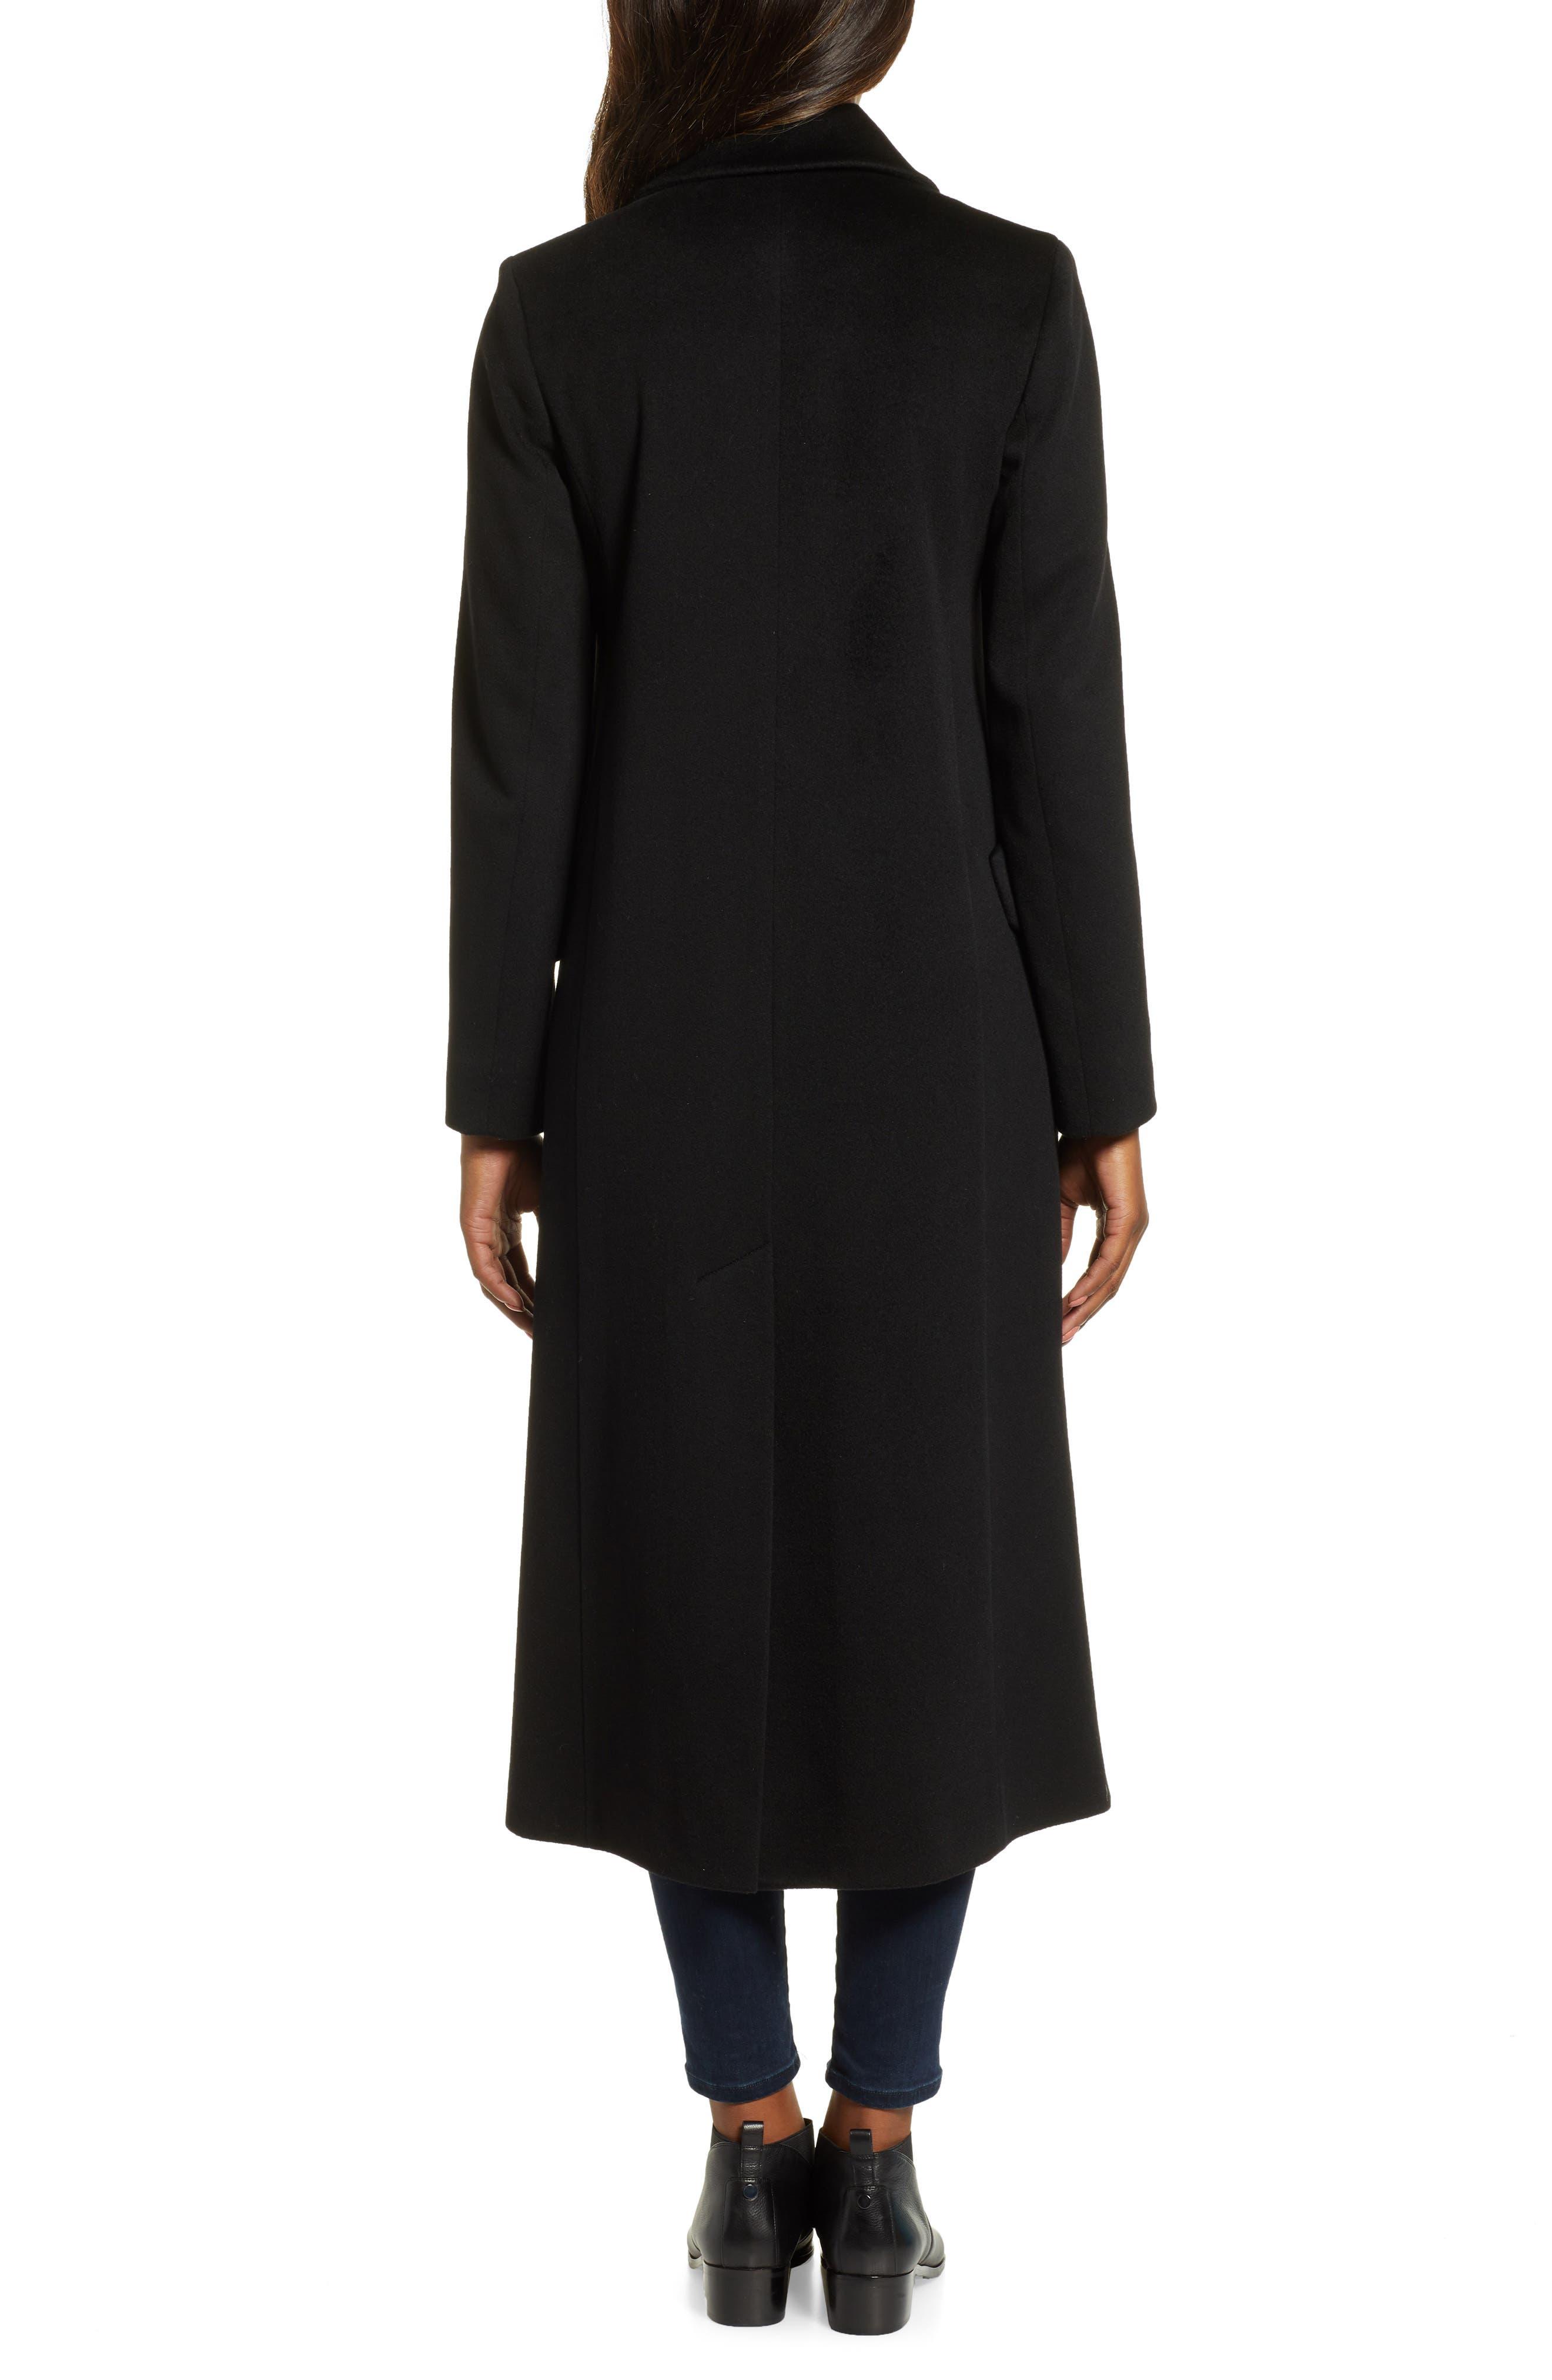 35ecc0f1efce6 fleurette long coats for women